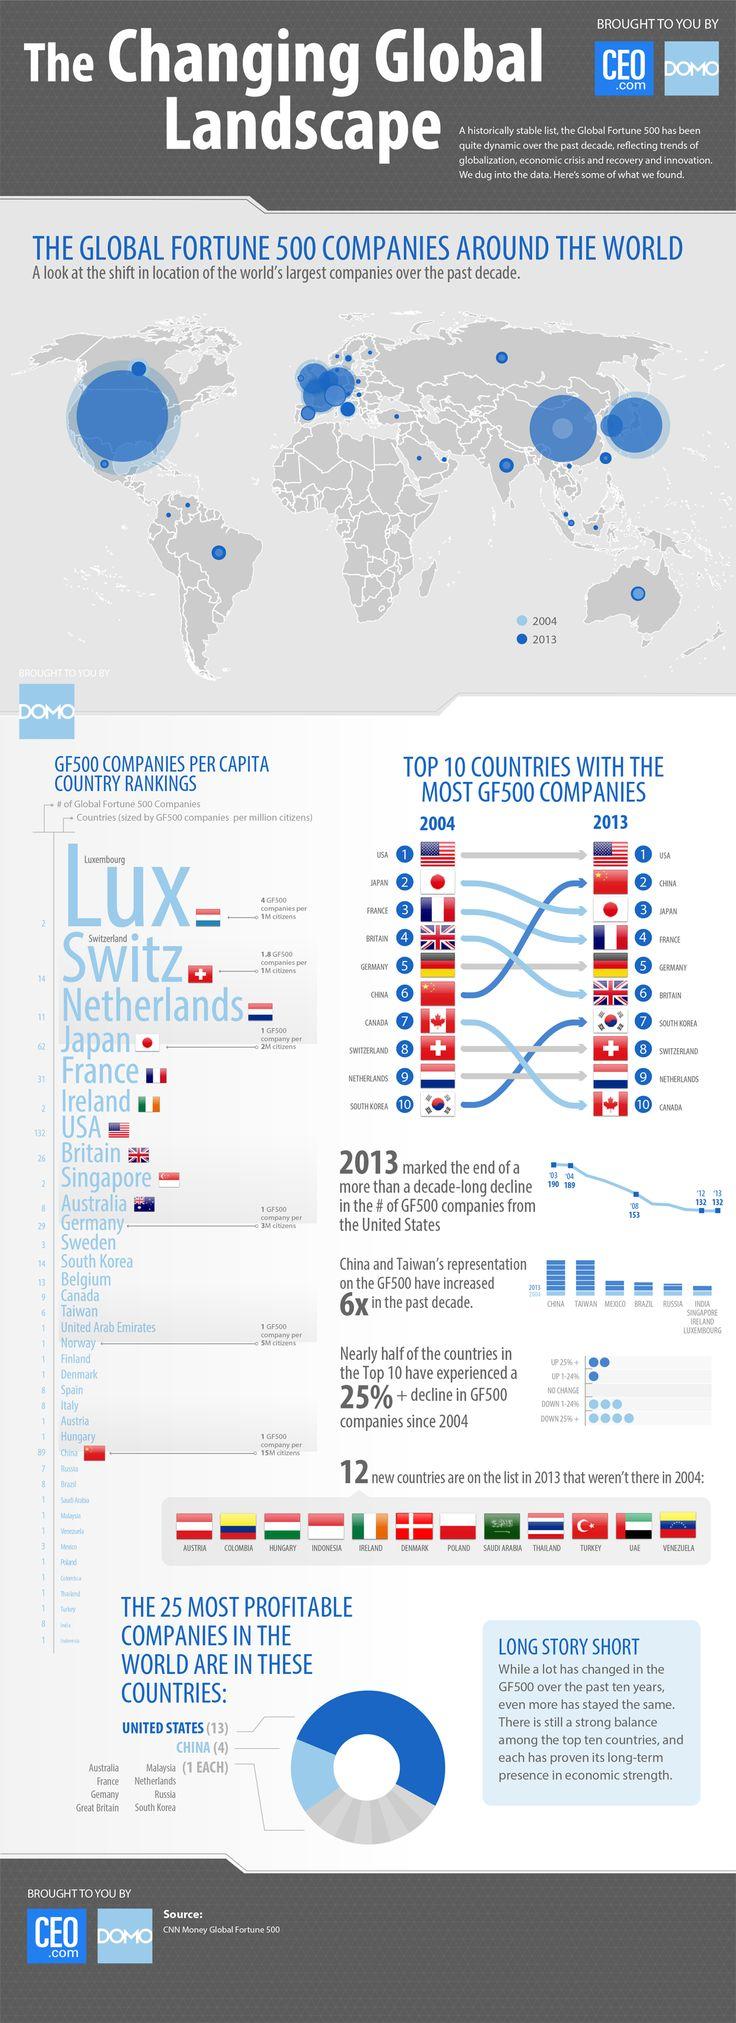 Changing Global Landscape - Fortune Global 500